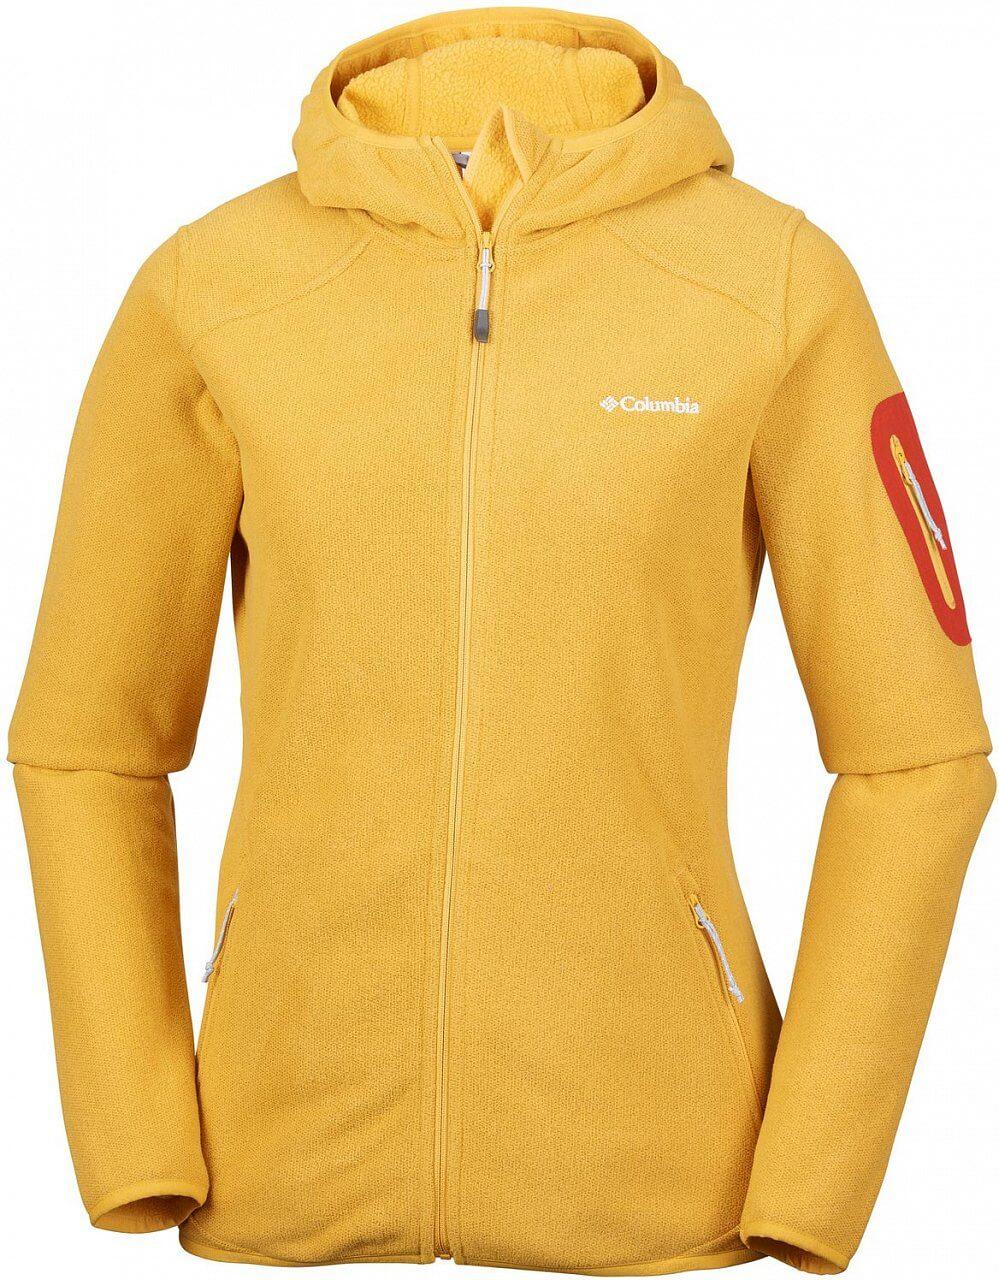 Columbia Outdoor Novelty Hooded Fleece | Sanasport.cz